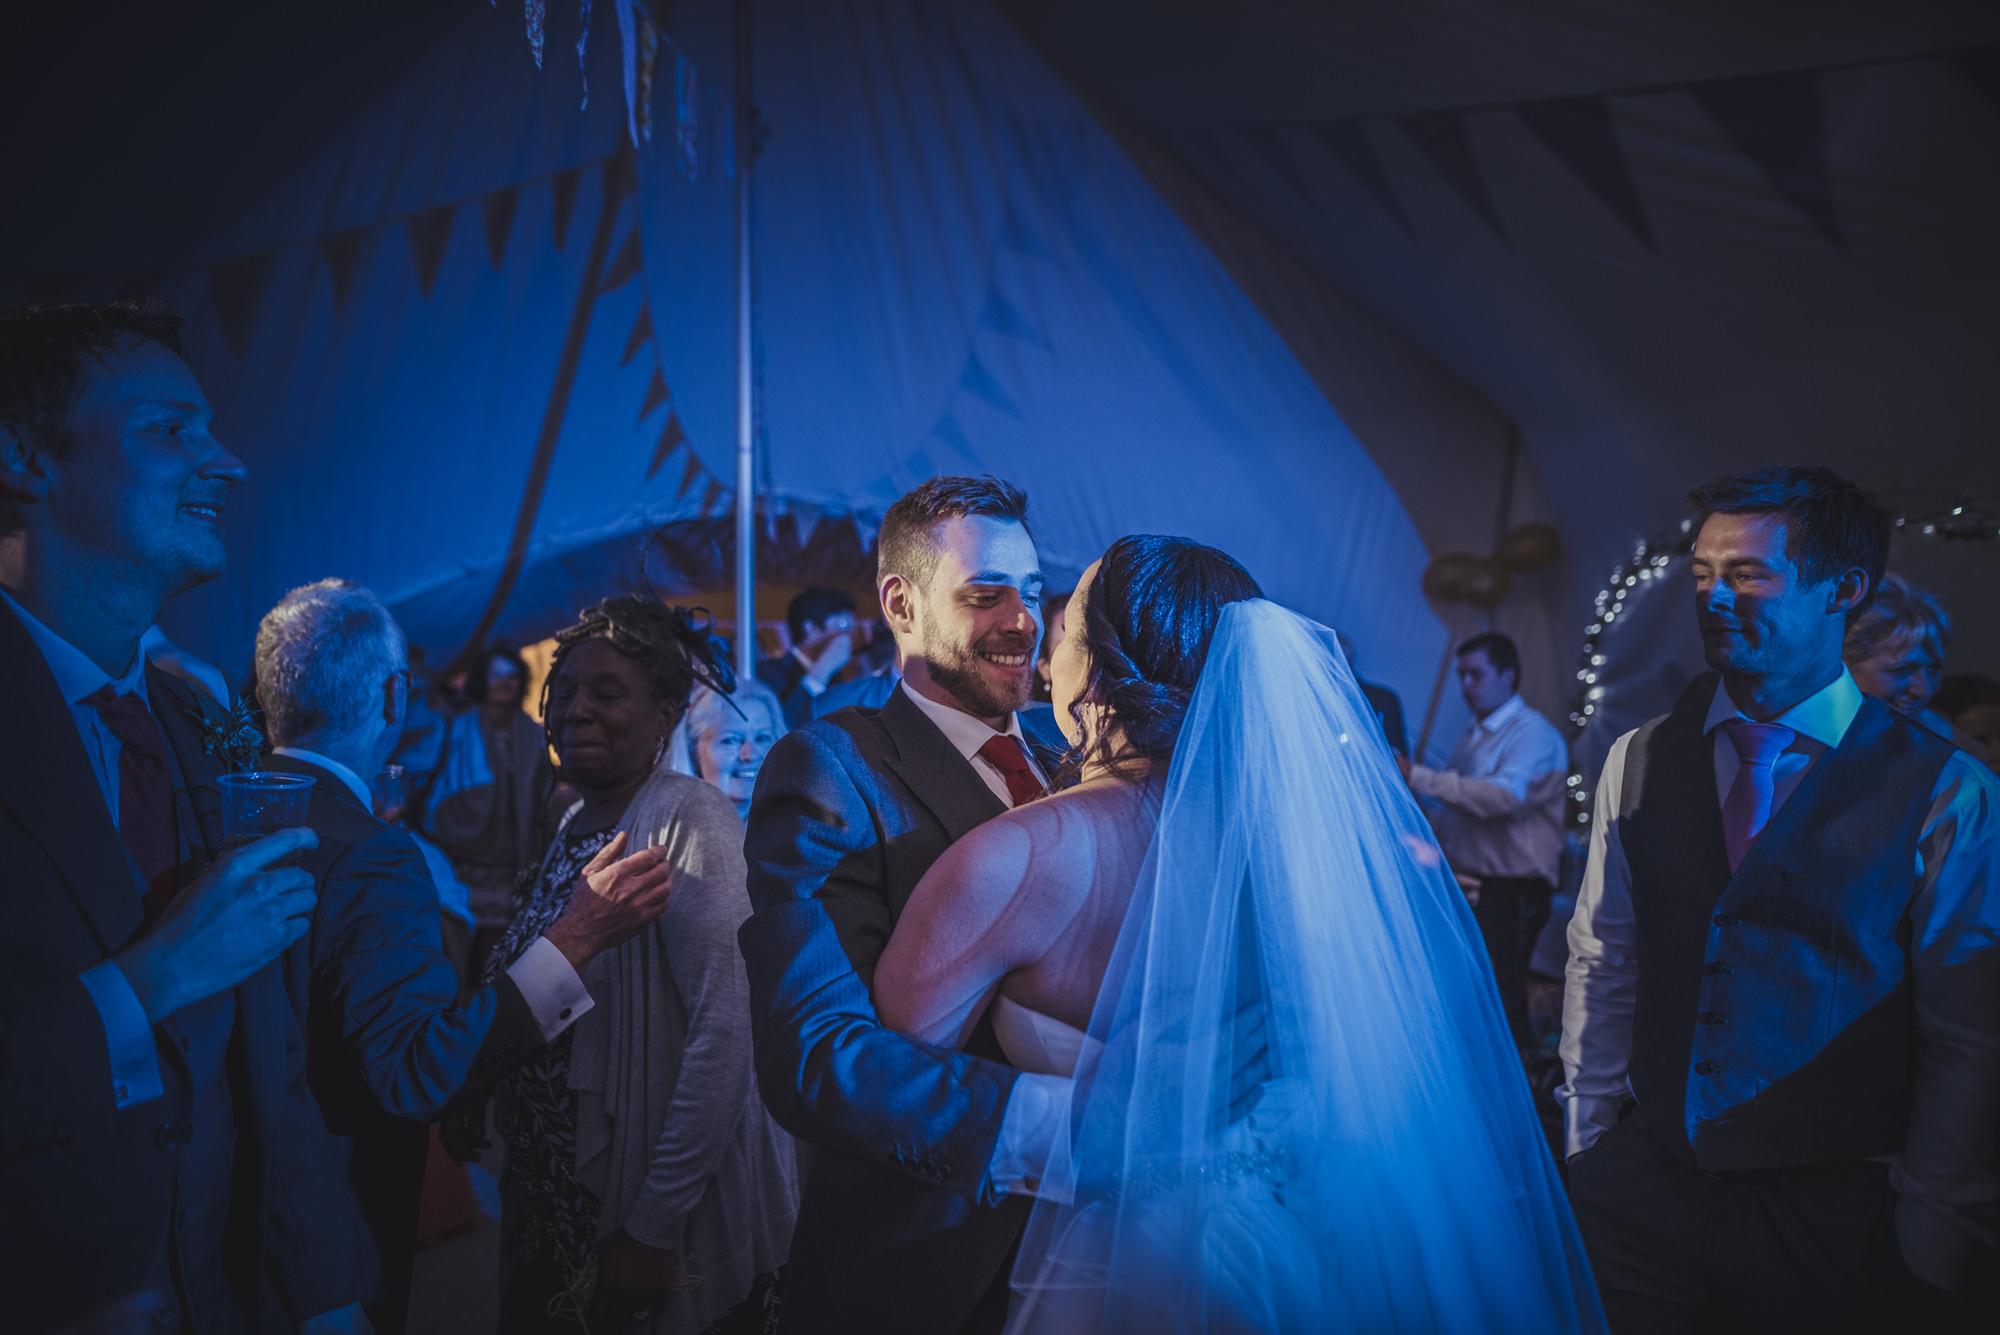 Jacqueline-Gareth-Wedding-Westmead-Events-Surrey-Manu-Mendoza-Wedding-Photography-536.jpg